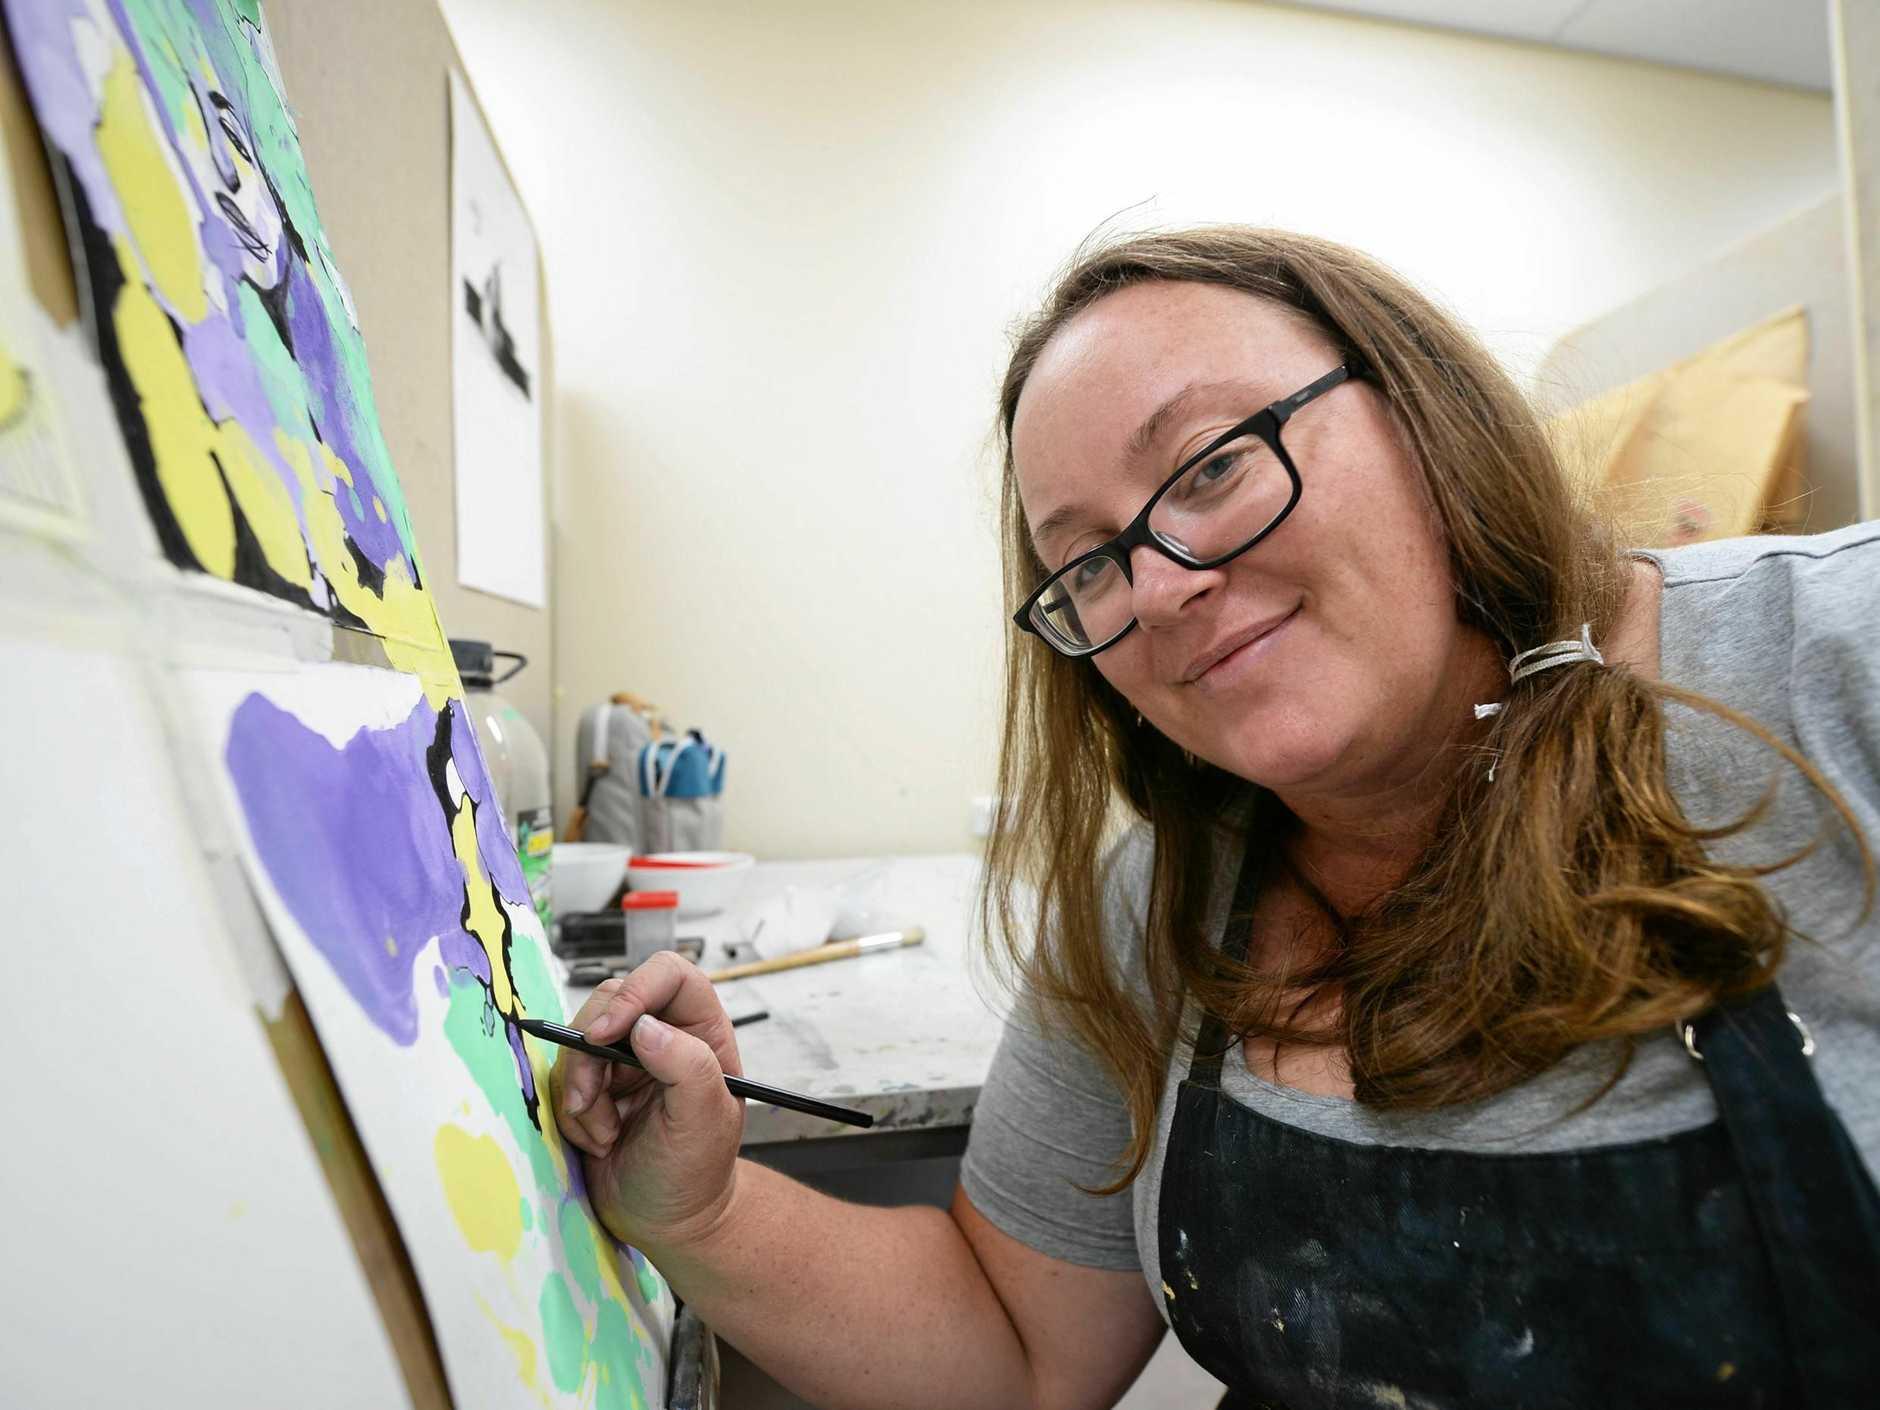 RAW TALANT: CQUniversity Bachelor of Creative Arts student Elisha Habermann.